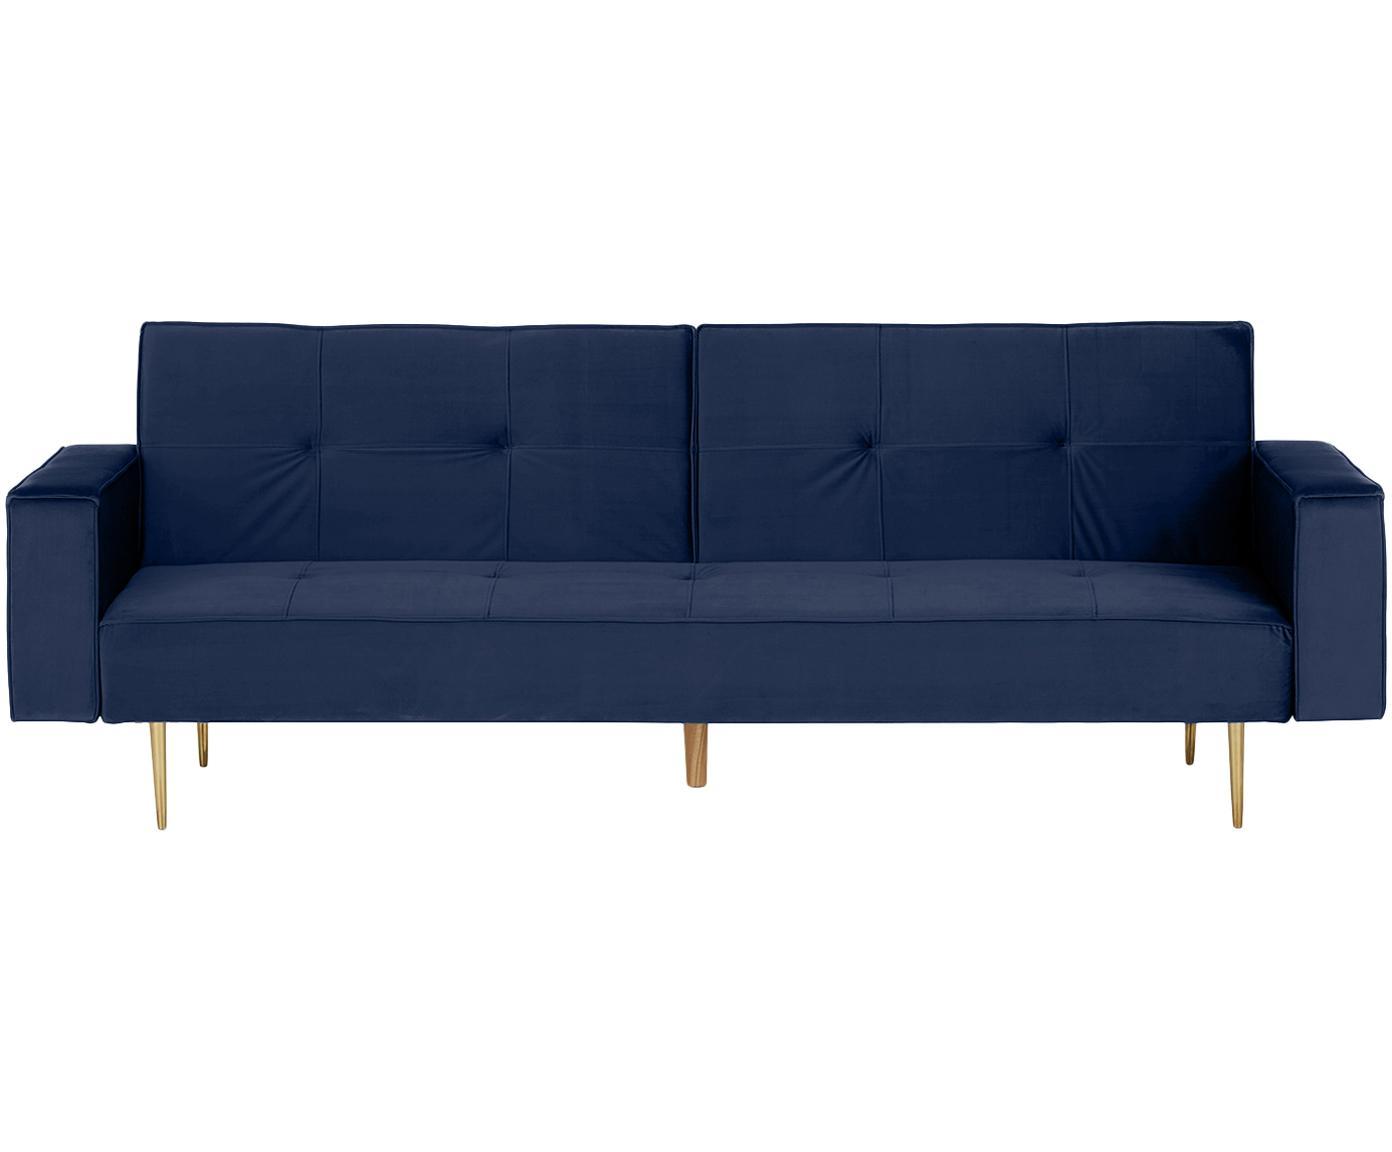 Samt-Schlafsofa Bridgit, Bezug: Samt (Polyester) 28.000 S, Gestell: Kiefernholz, Füße: Kautschukholz, Samt Blau, 232 x 81 cm